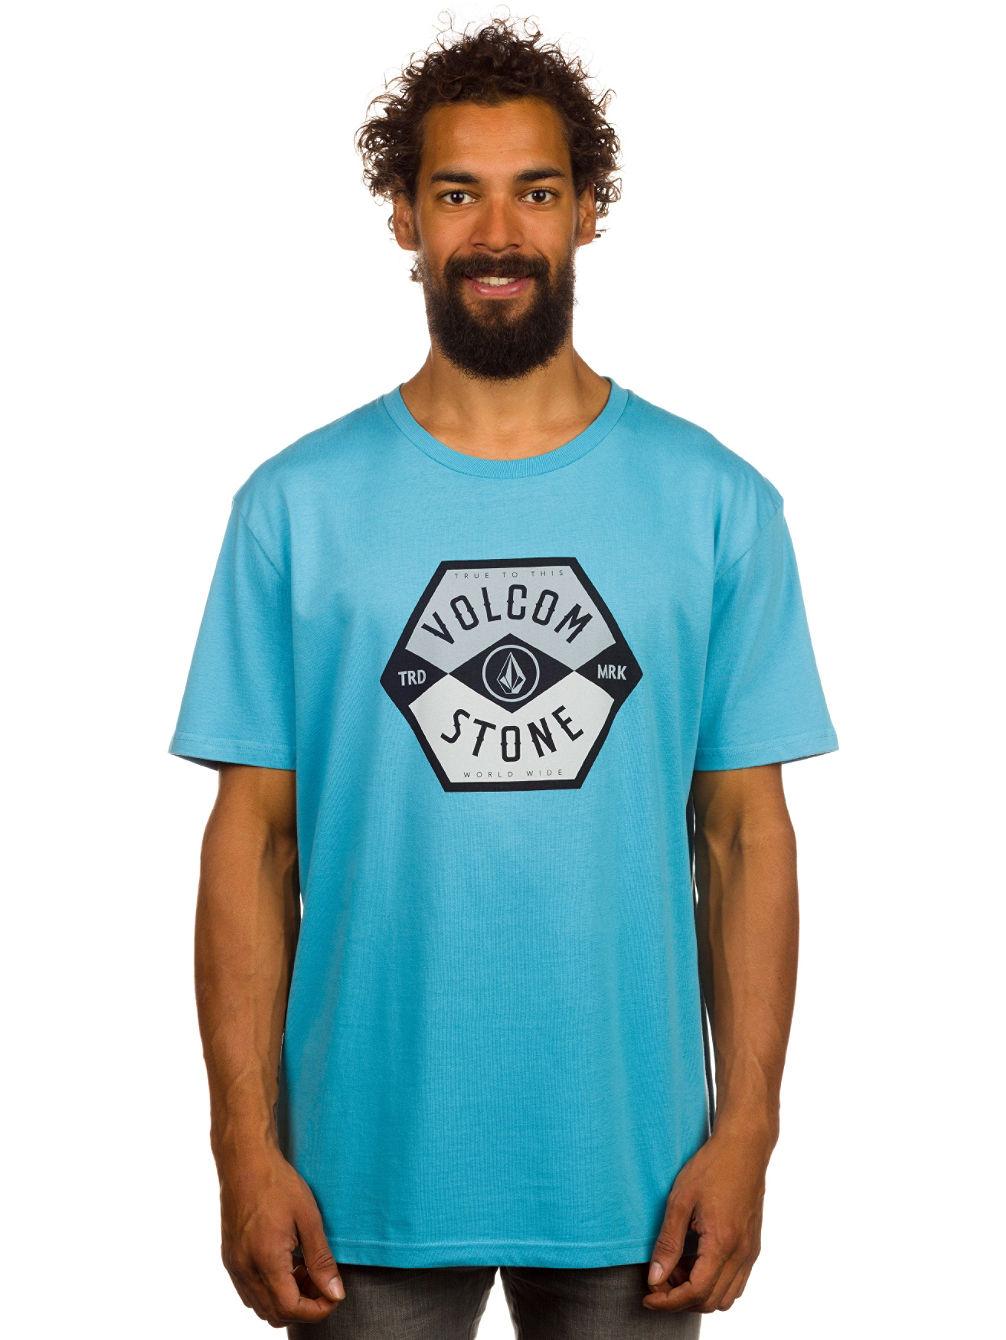 miners-t-shirt